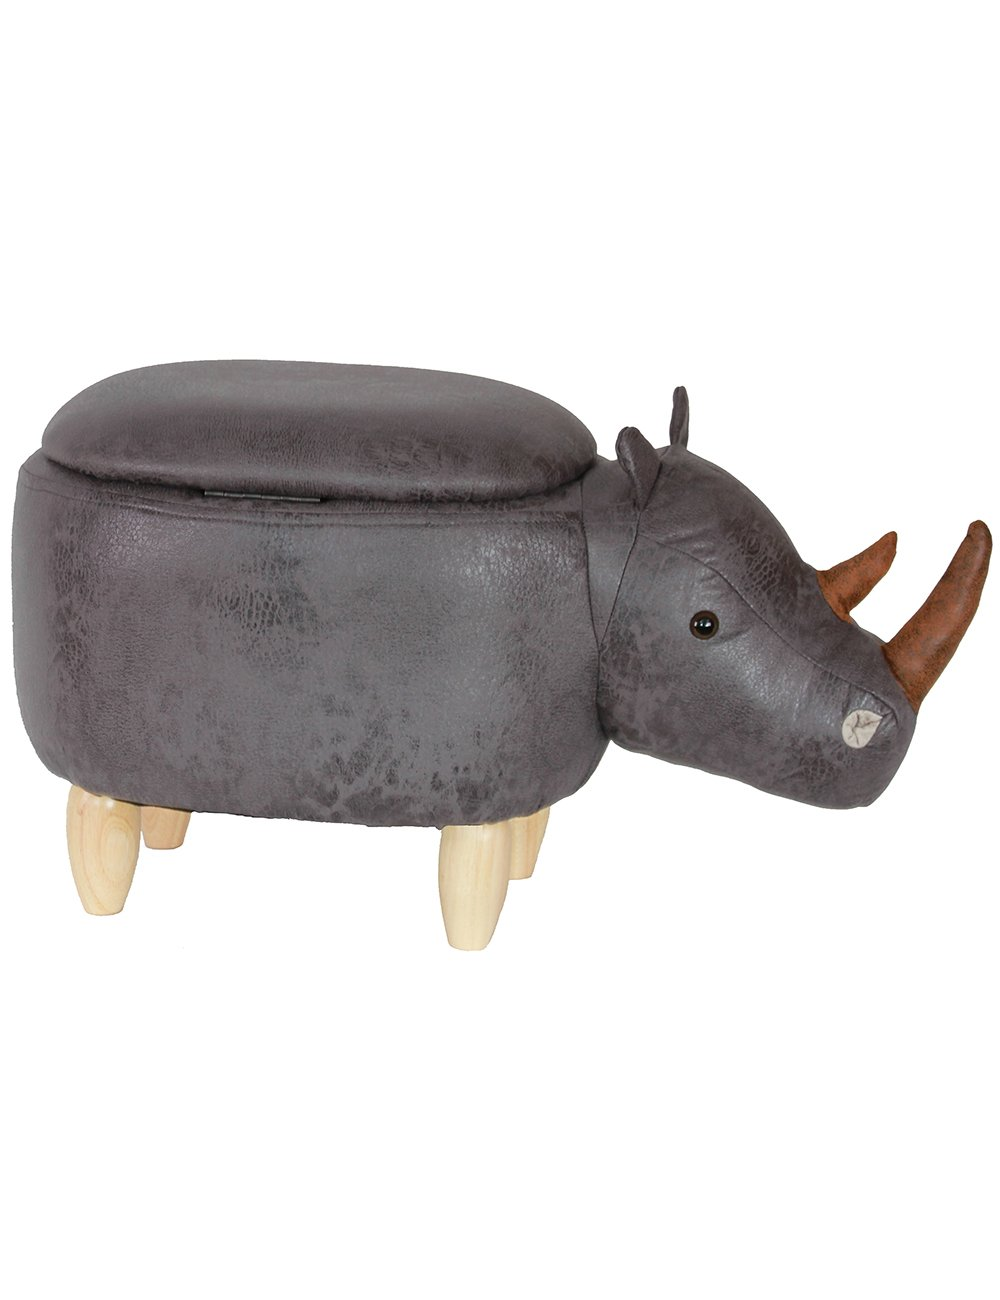 HAOSOON Animal ottoman Series Storage Ottoman Footrest Stool with Vivid Adorable Animal-Like Features(Rhinoceros) (grey) by HAOSOON (Image #3)